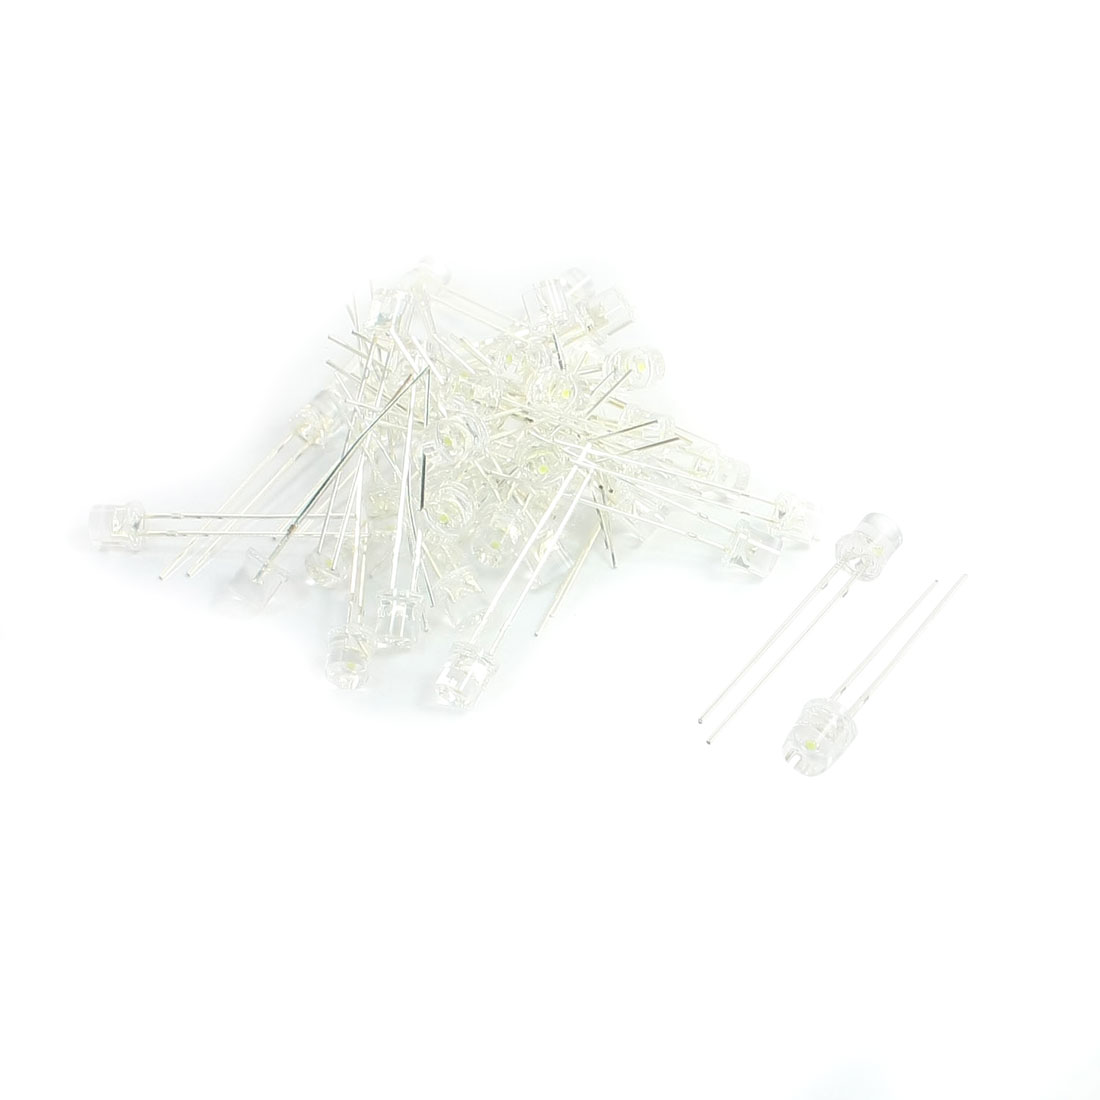 50Pcs 5 x 5mm Soldering Round Head White LED Light Diodes DC3V 500mA